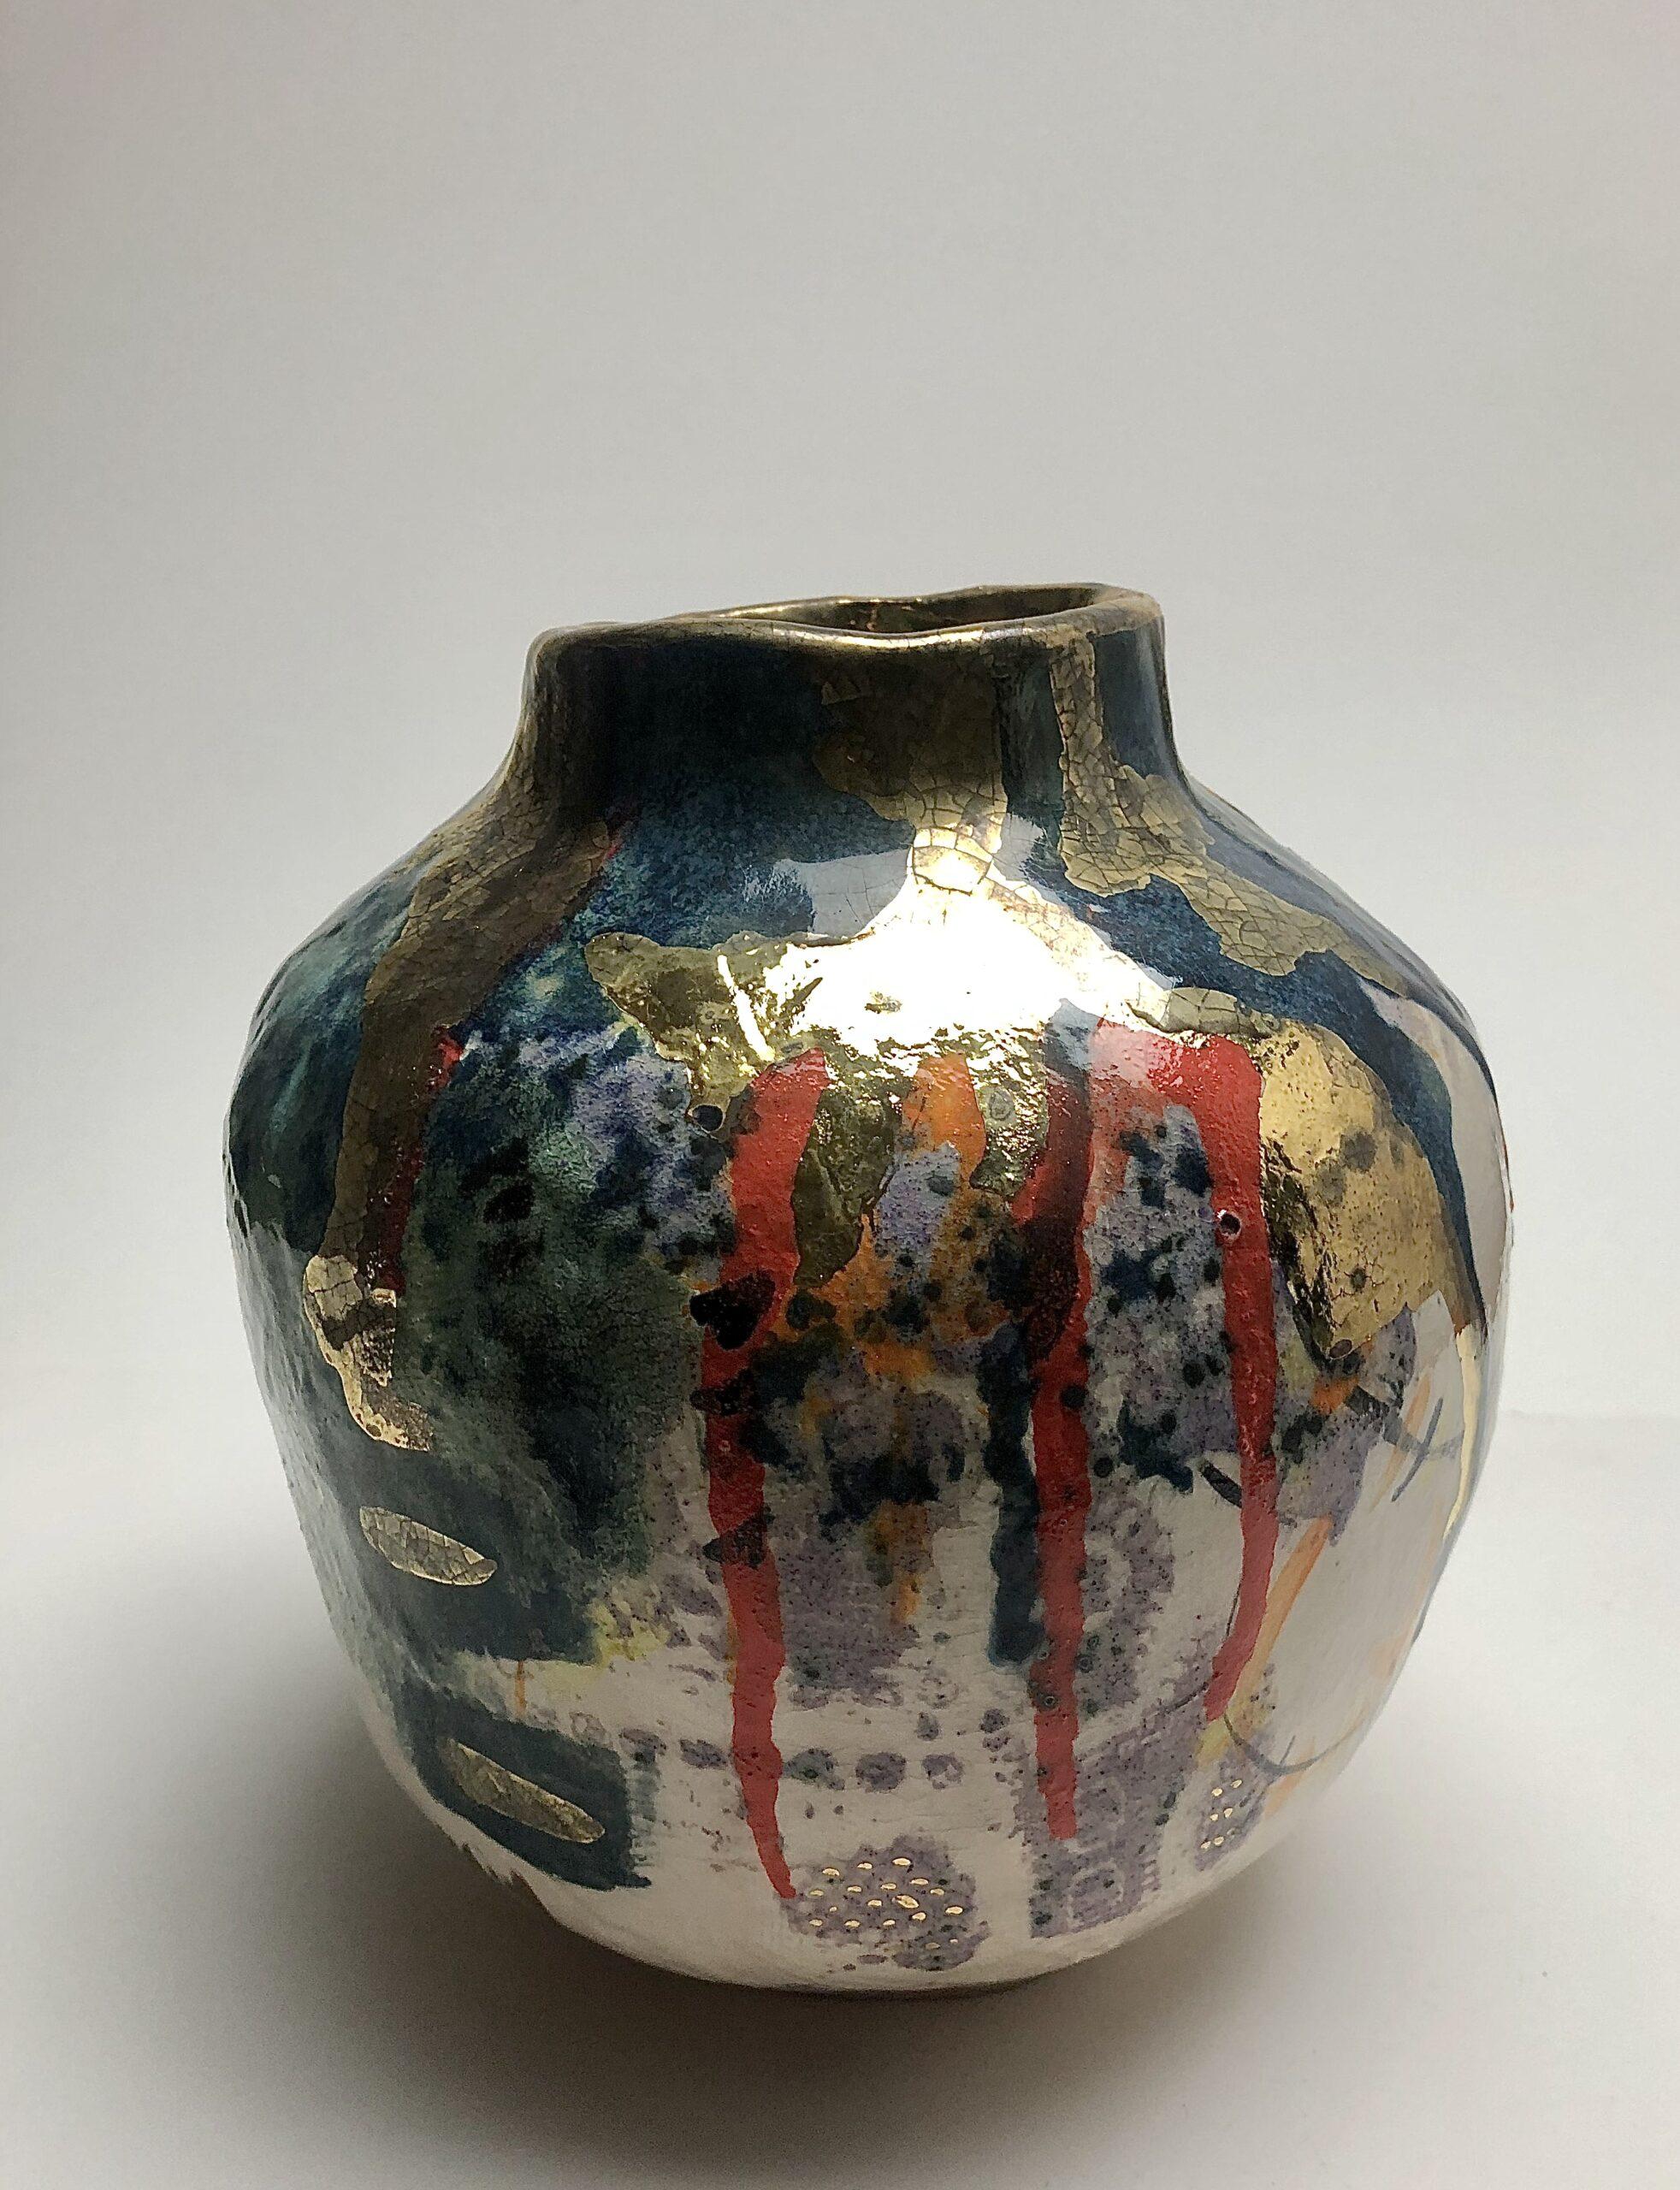 Harrogate Gallery, Pietro Sanna, ceramics